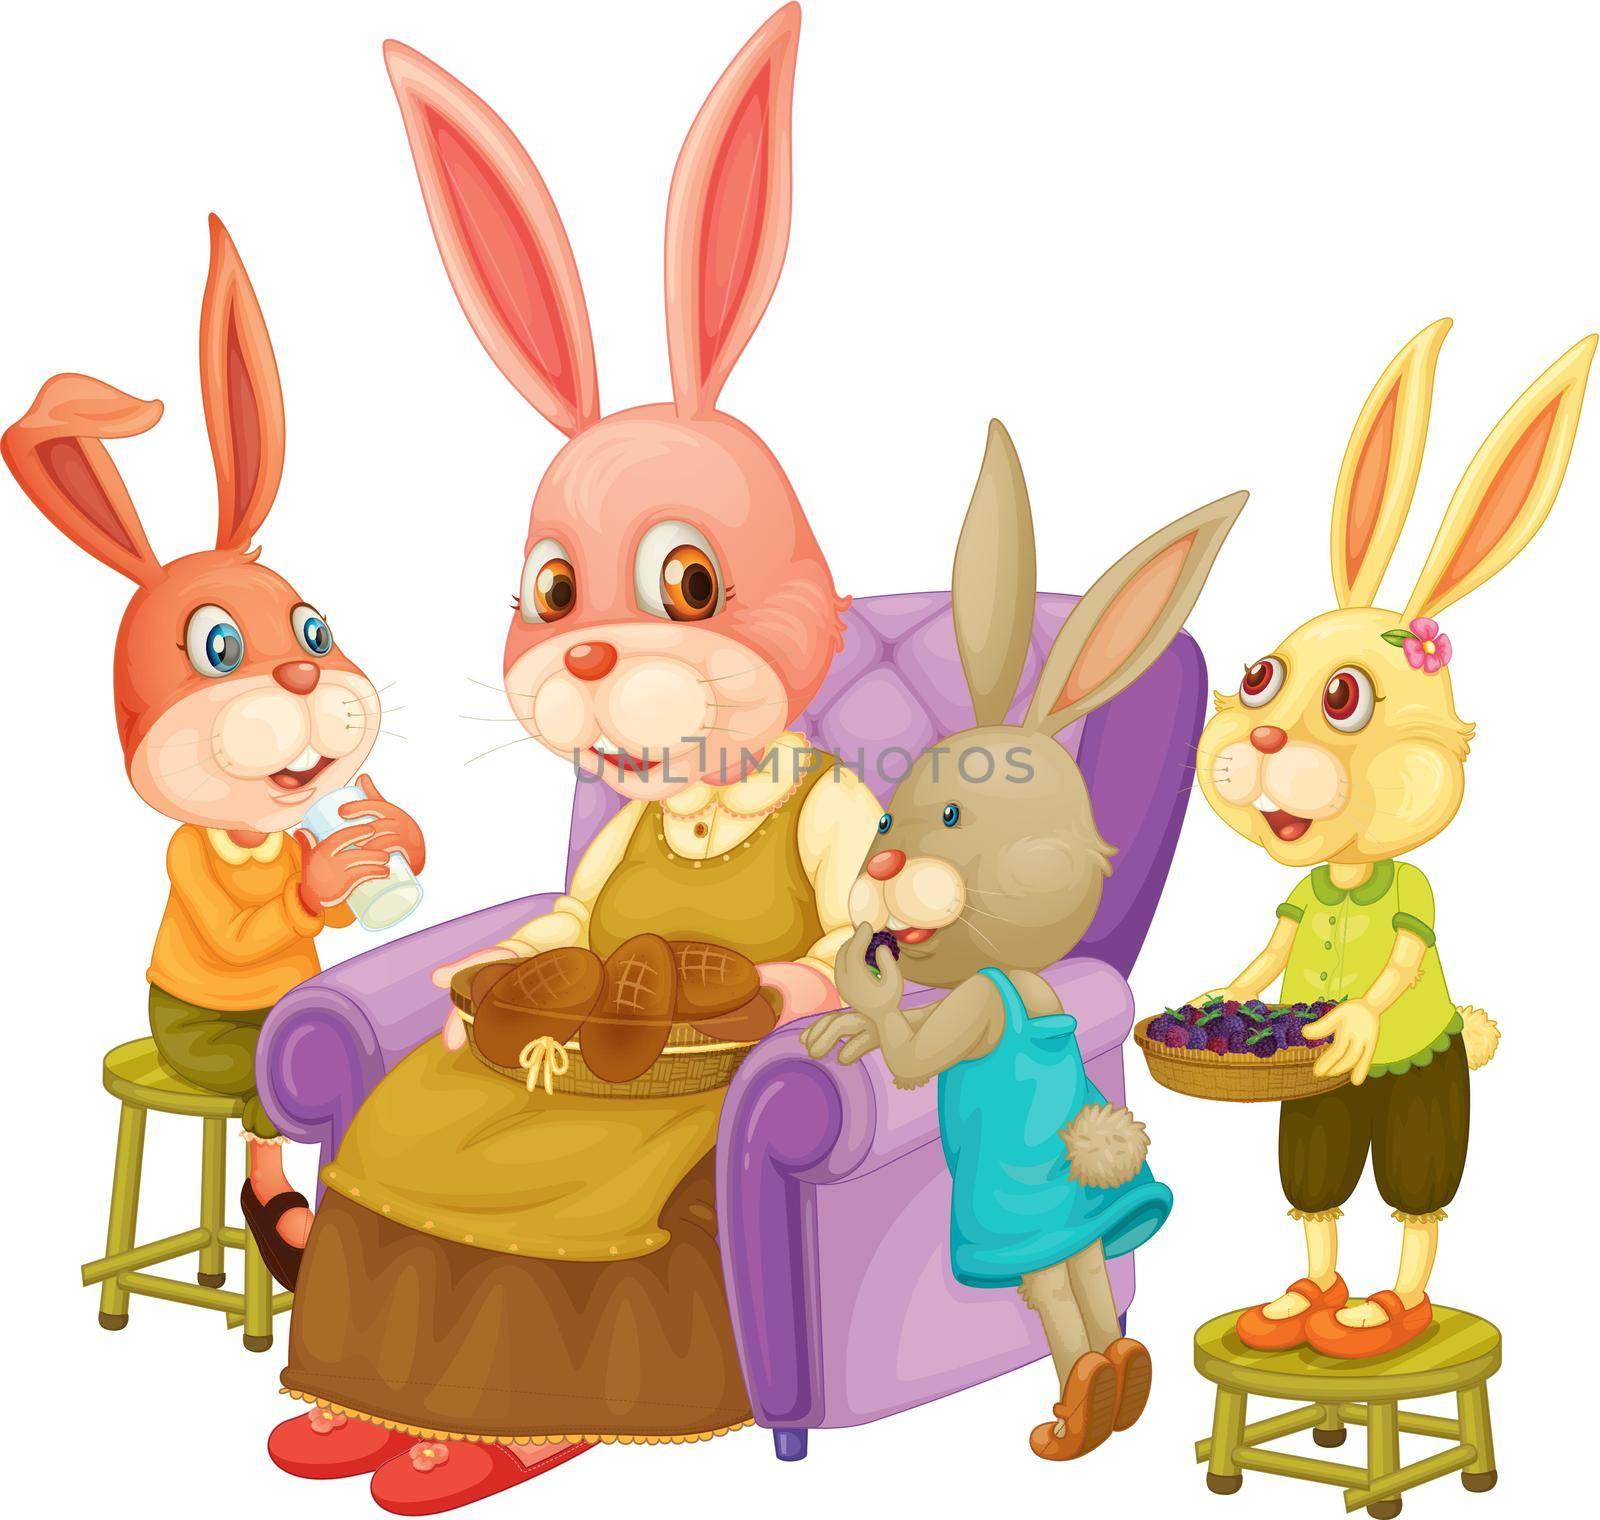 Illustration of family of rabbits